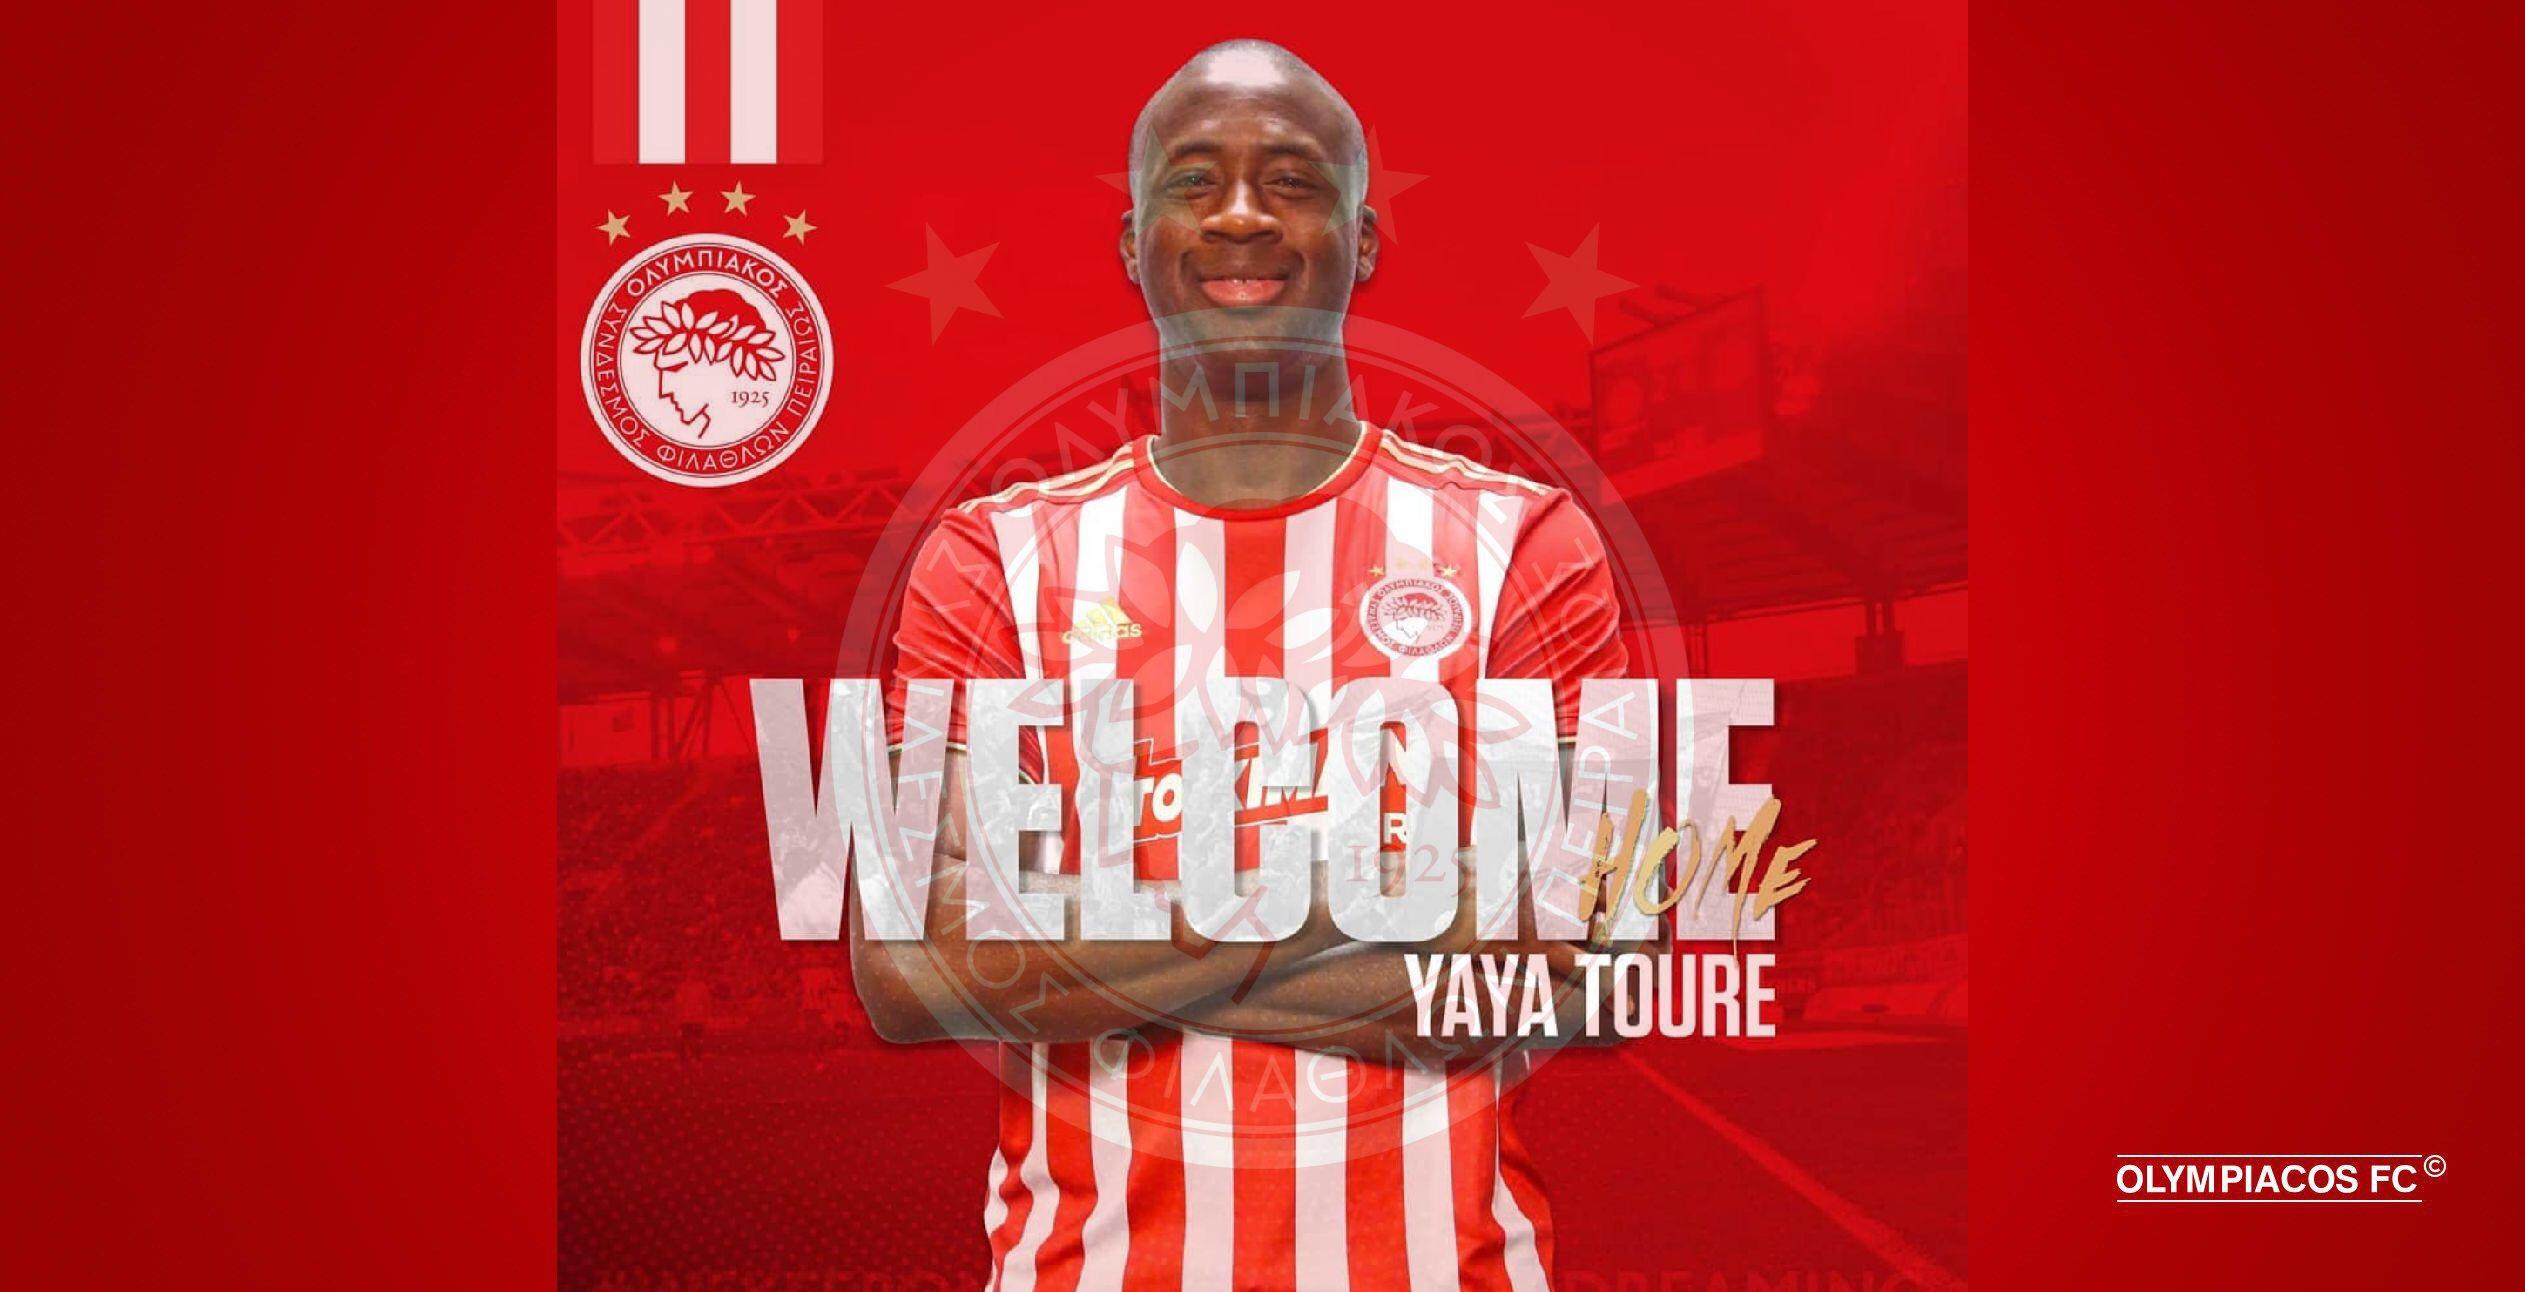 Yaya Toure returns to Olympiacos!